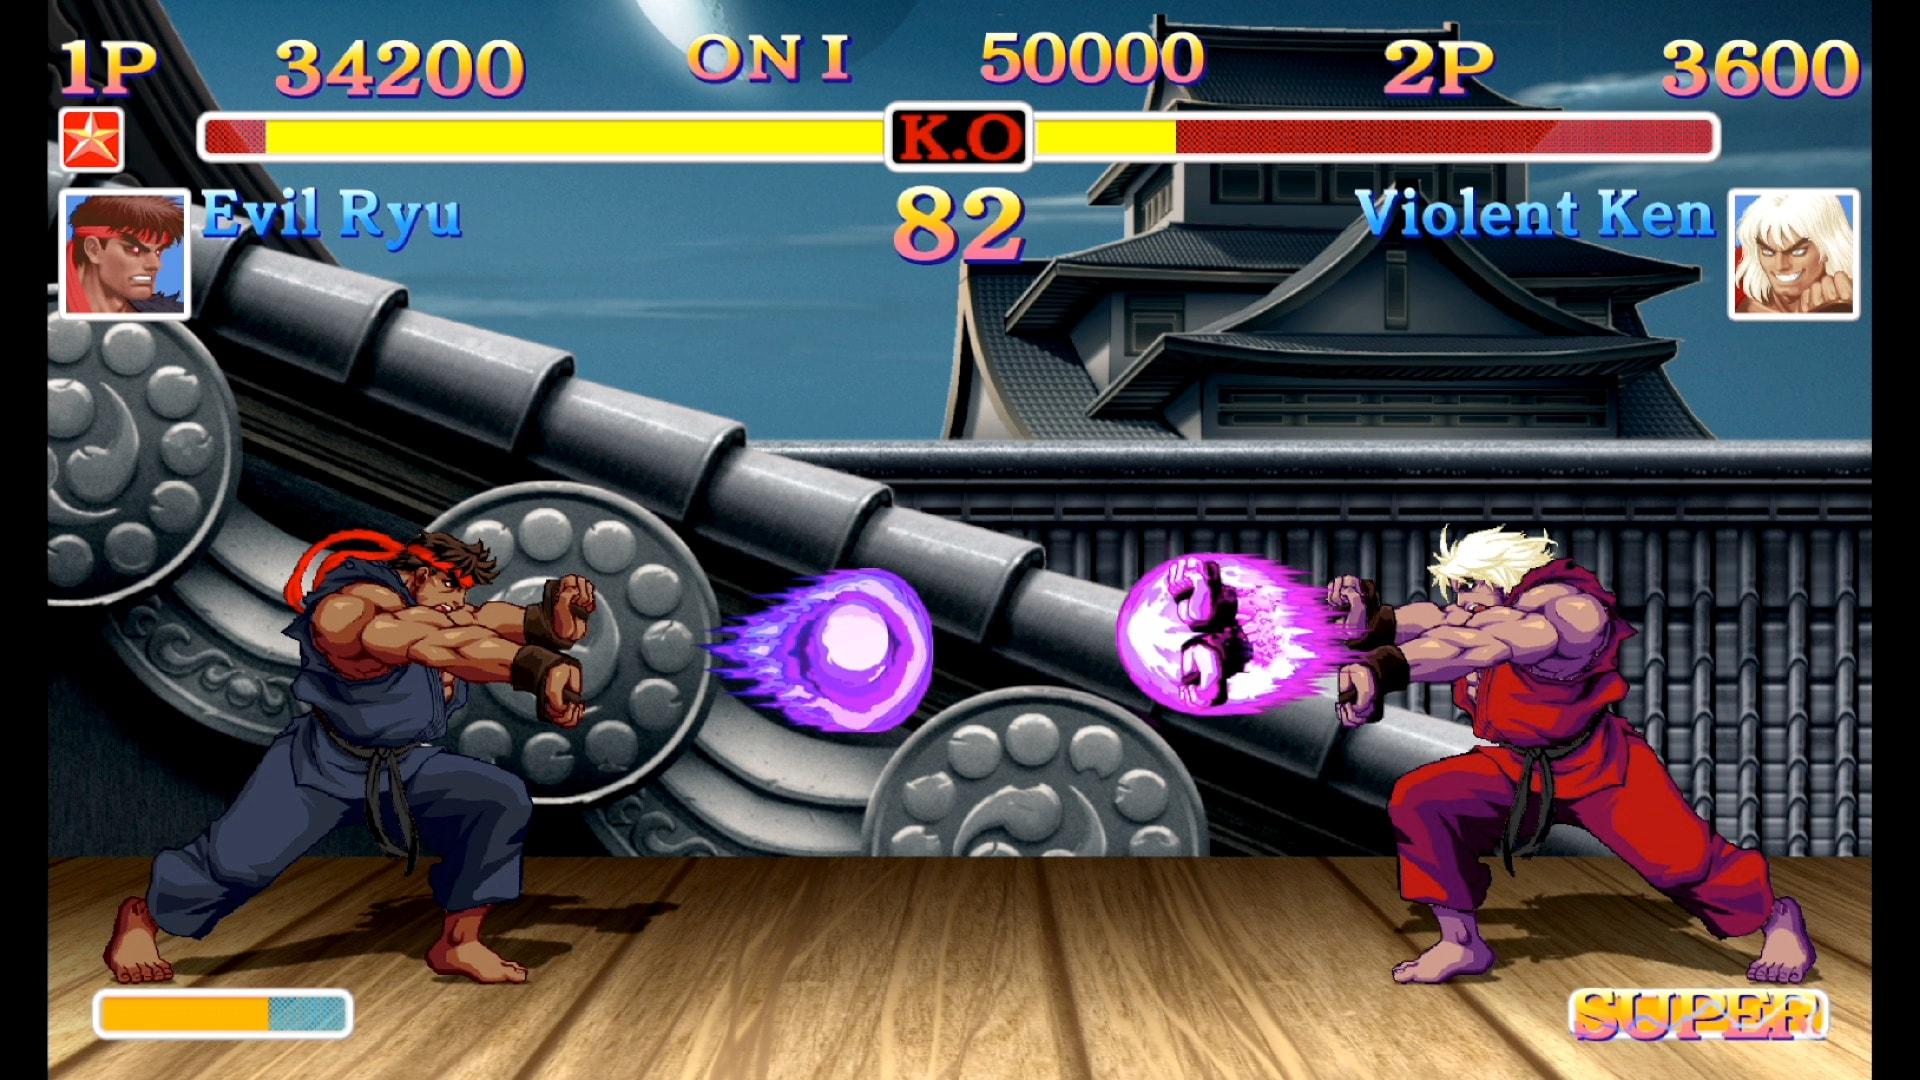 ultra-street-fighter-%e2%85%a1-the-final-challengers-nintendo-switch-1